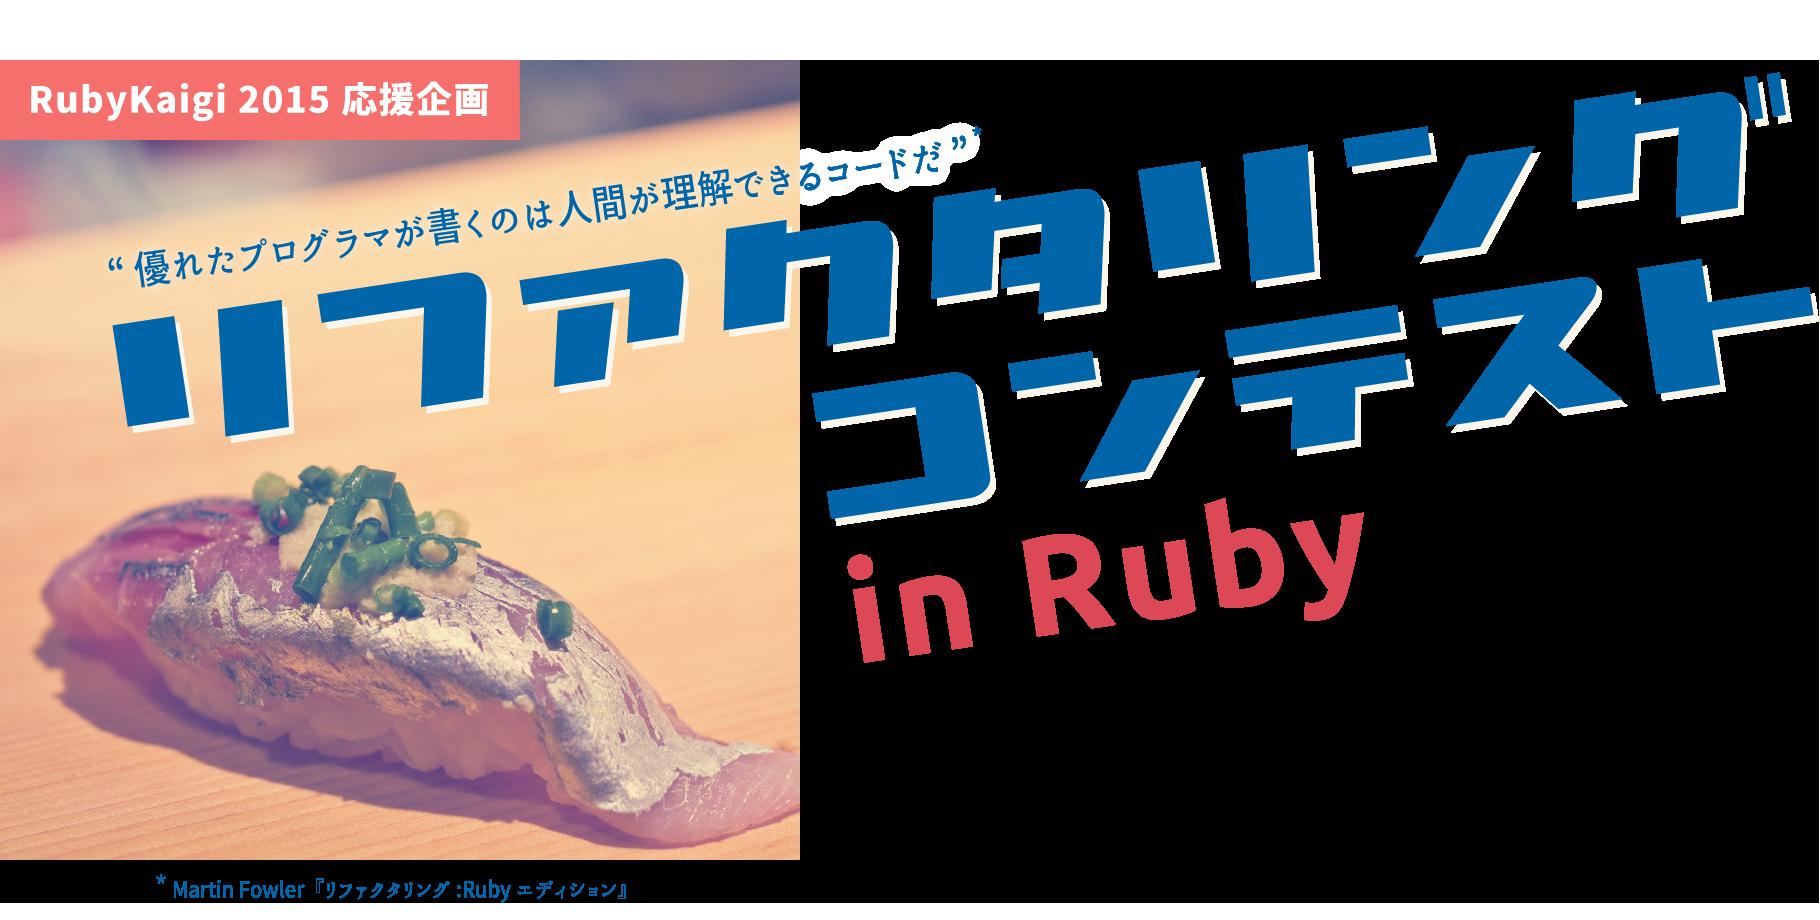 RubyKaigi 2015 応援企画 リファクタリングコンテスト in Ruby